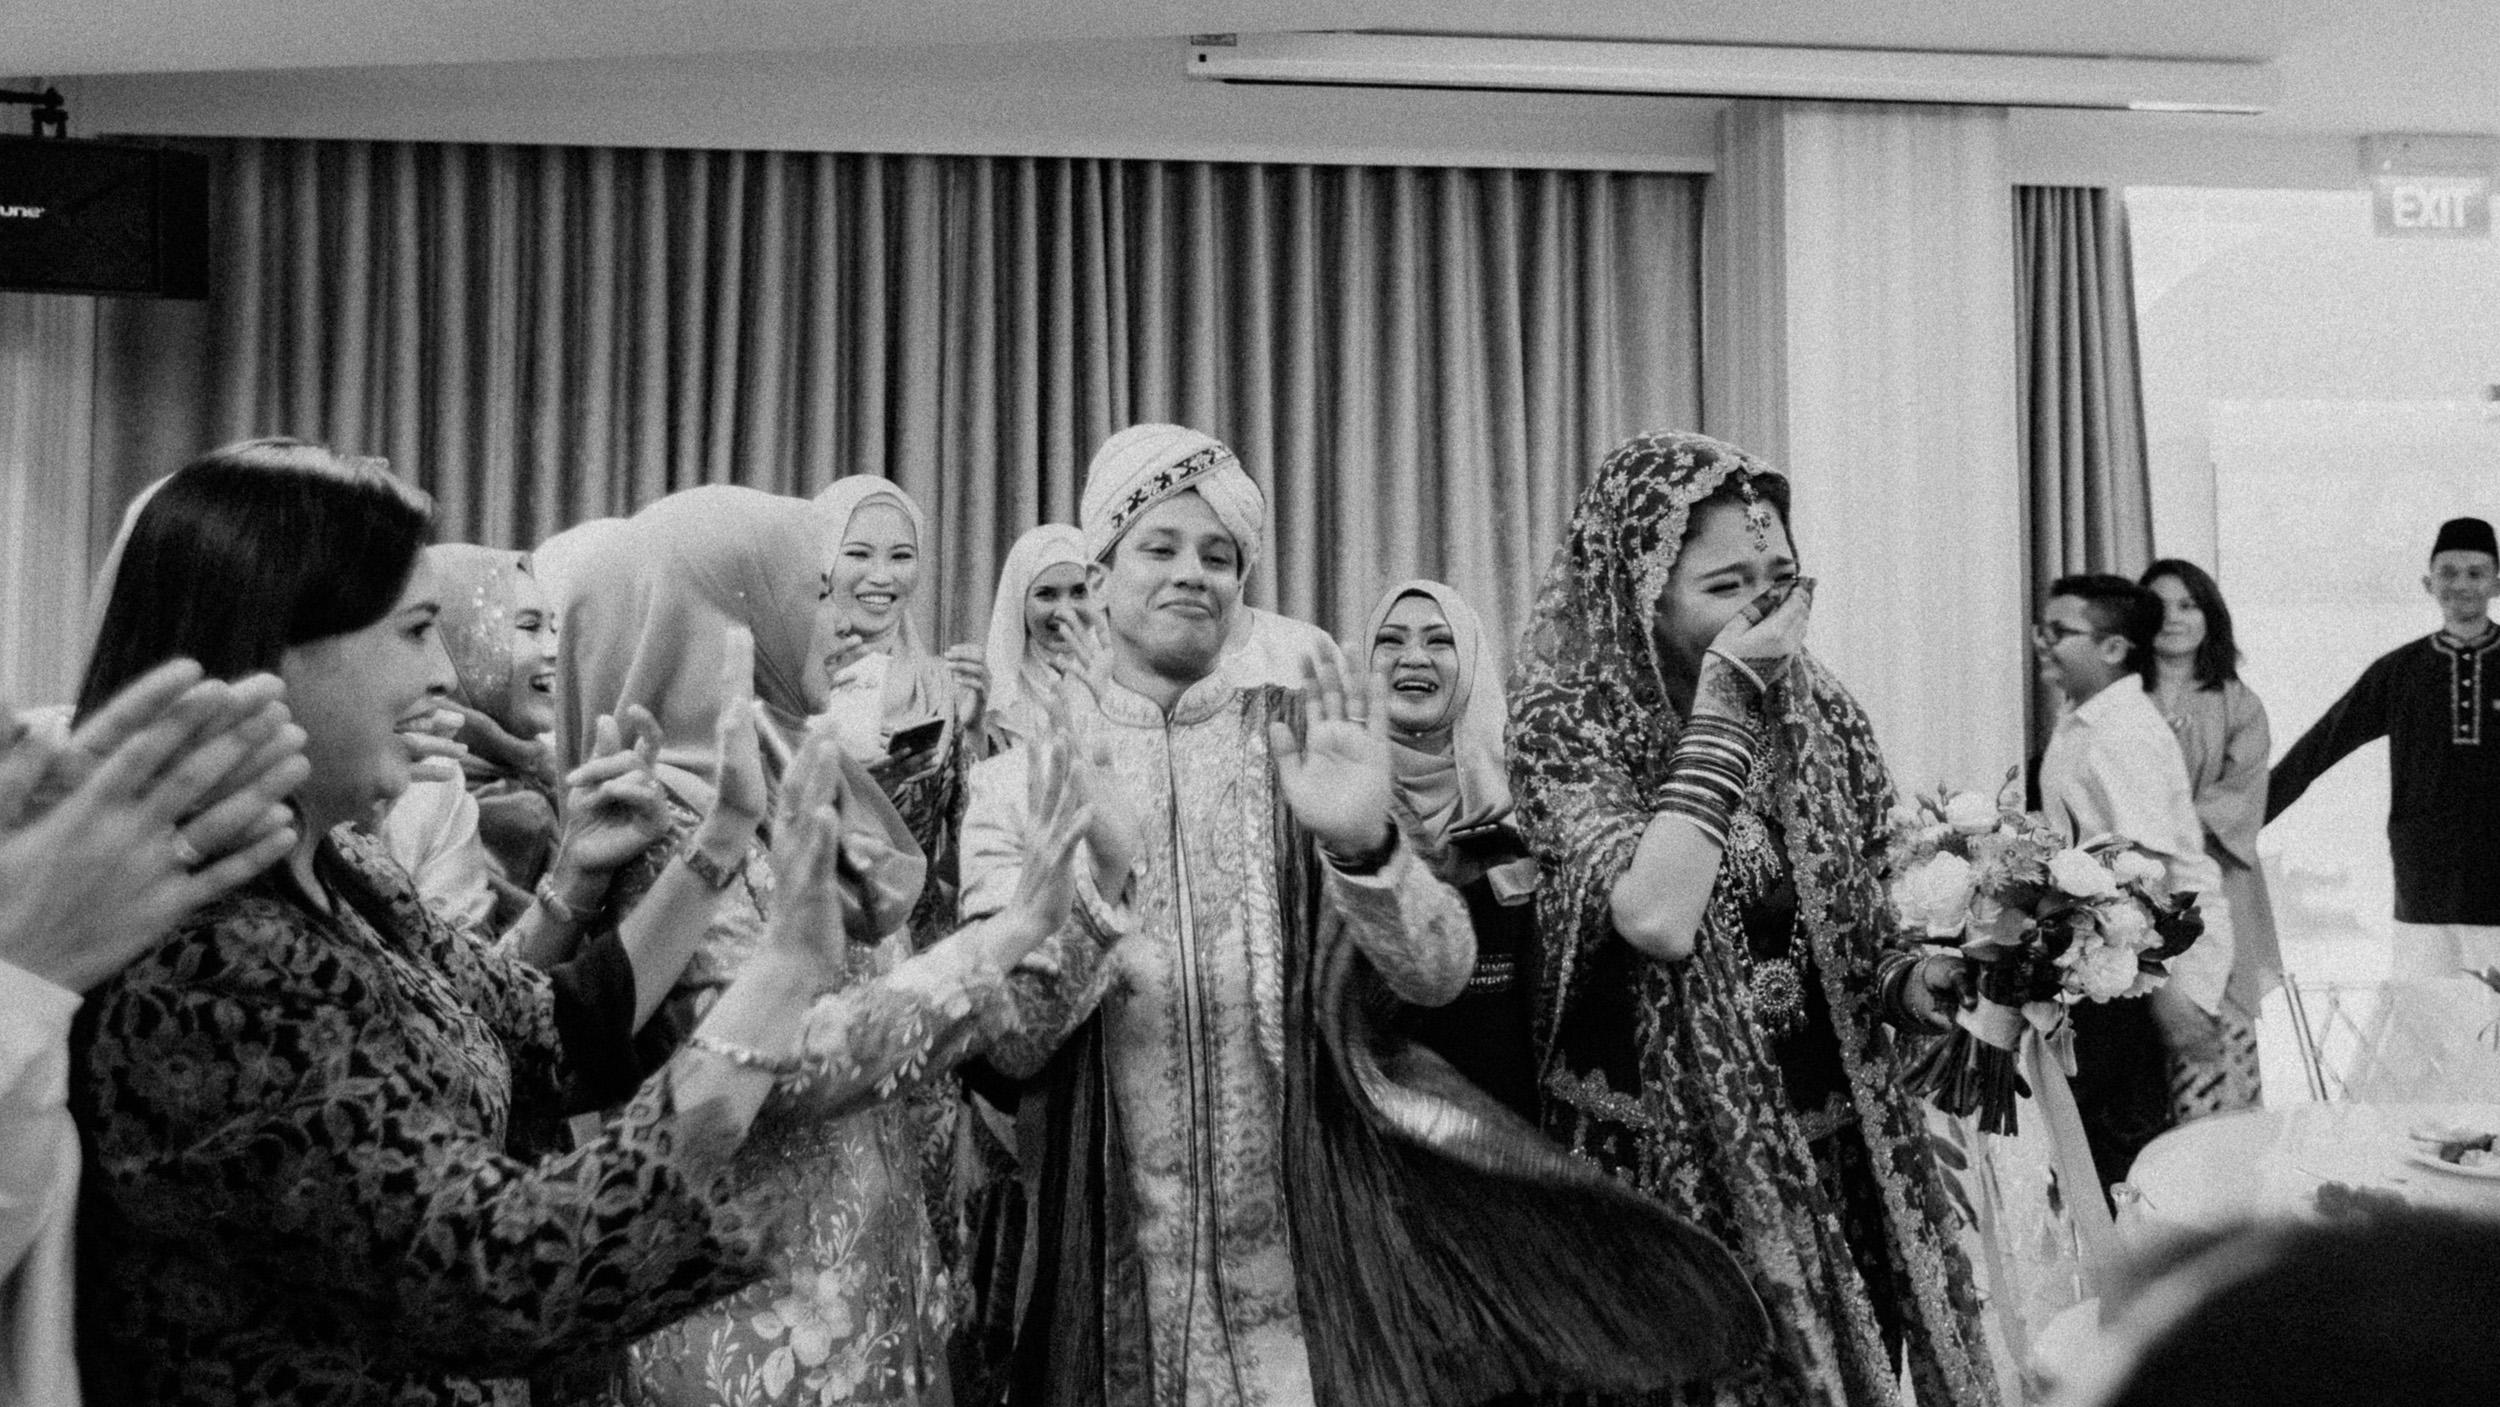 singapore-wedding-photographer-photography-wmt2017-139.jpg